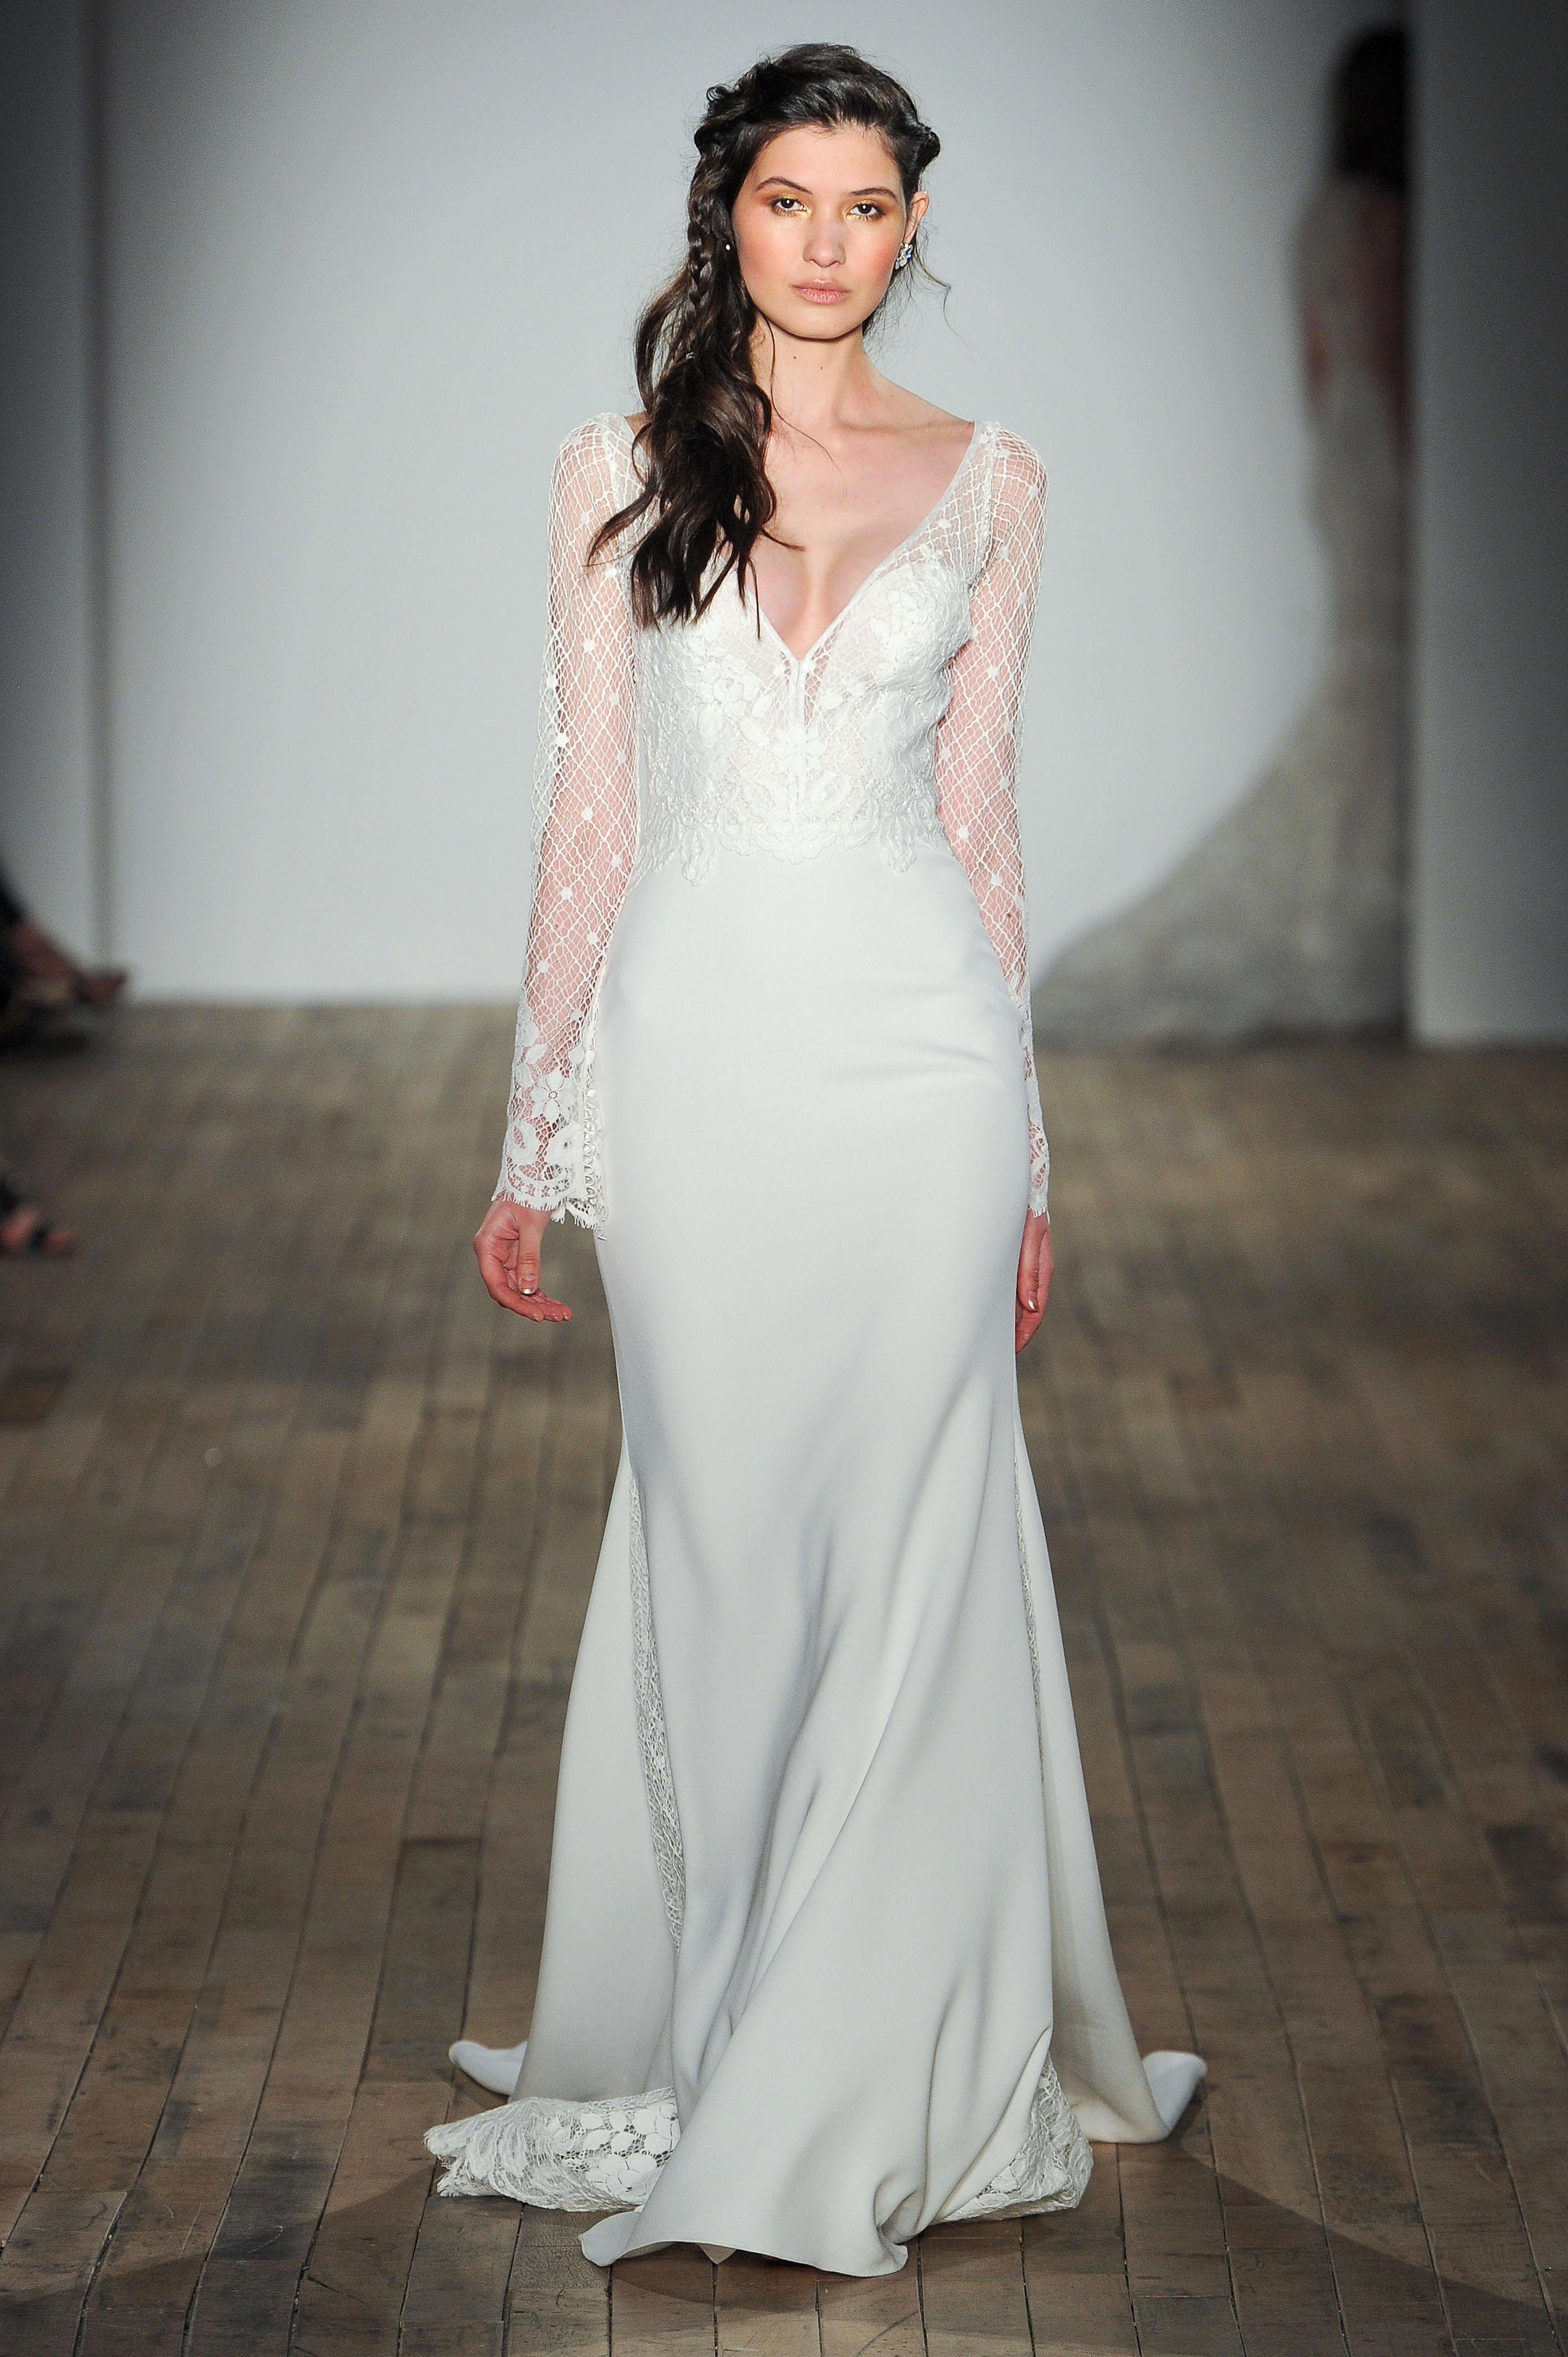 jlm tara keely v-neck long sleeves wedding dress spring 2018